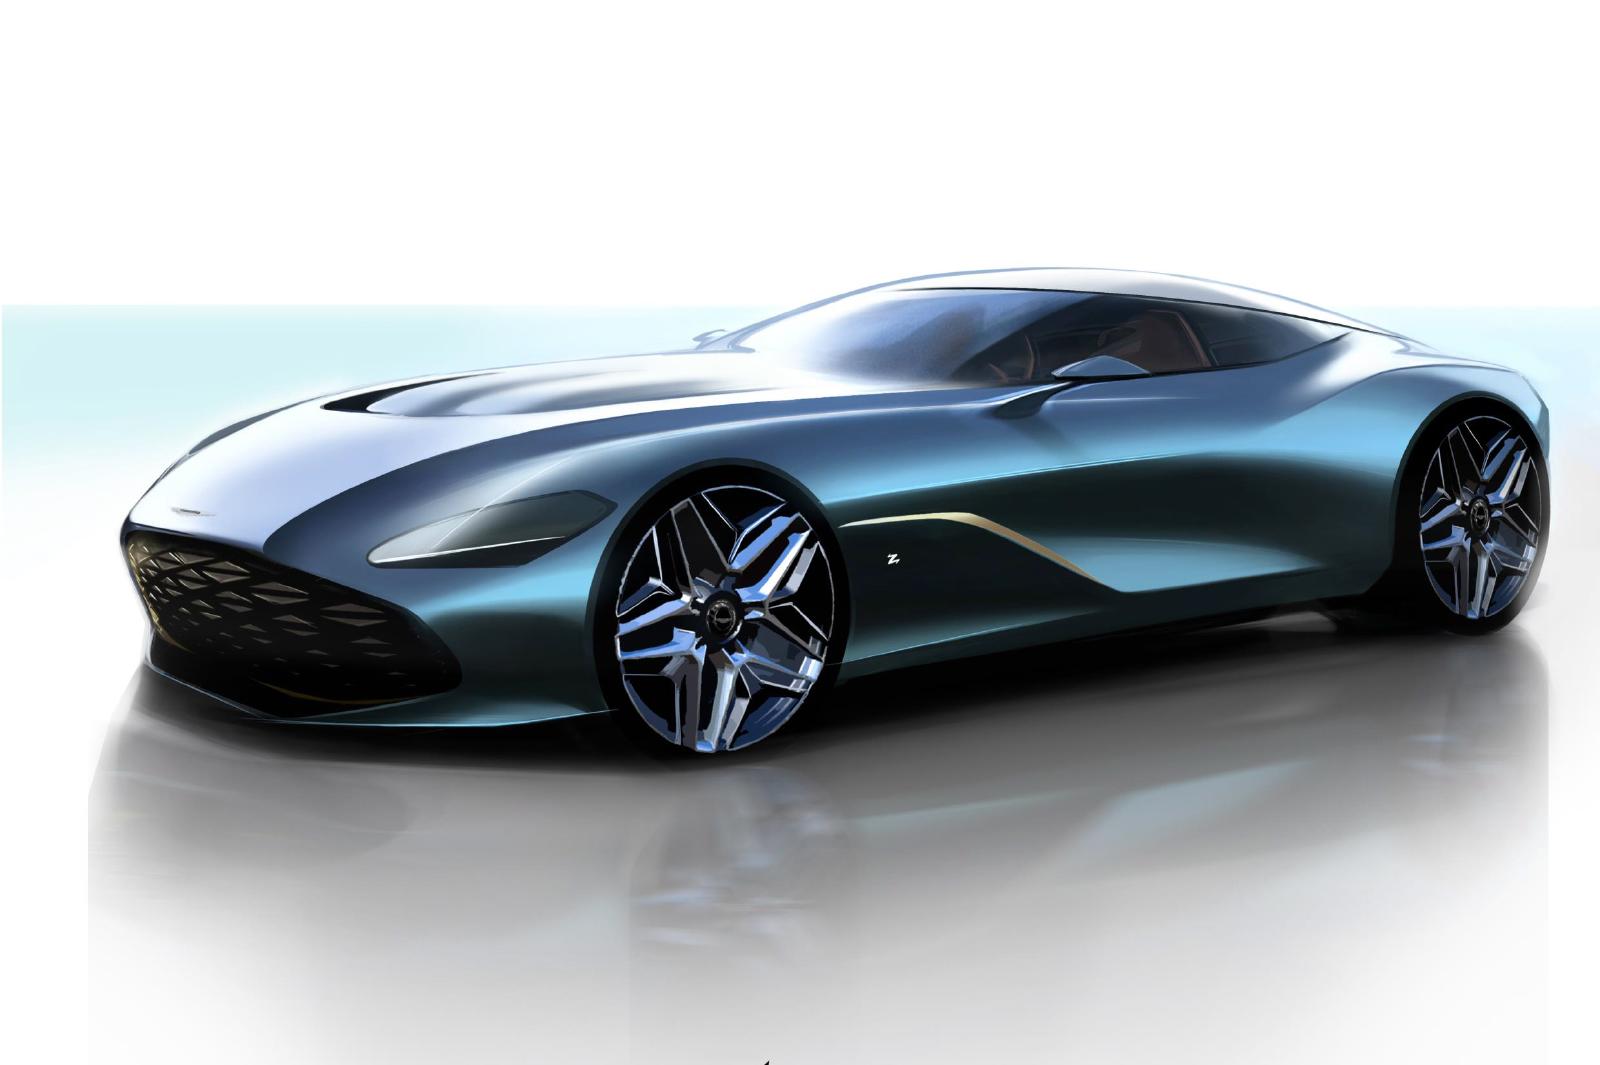 Aston Martin Reveals Dbs Gt Zagato